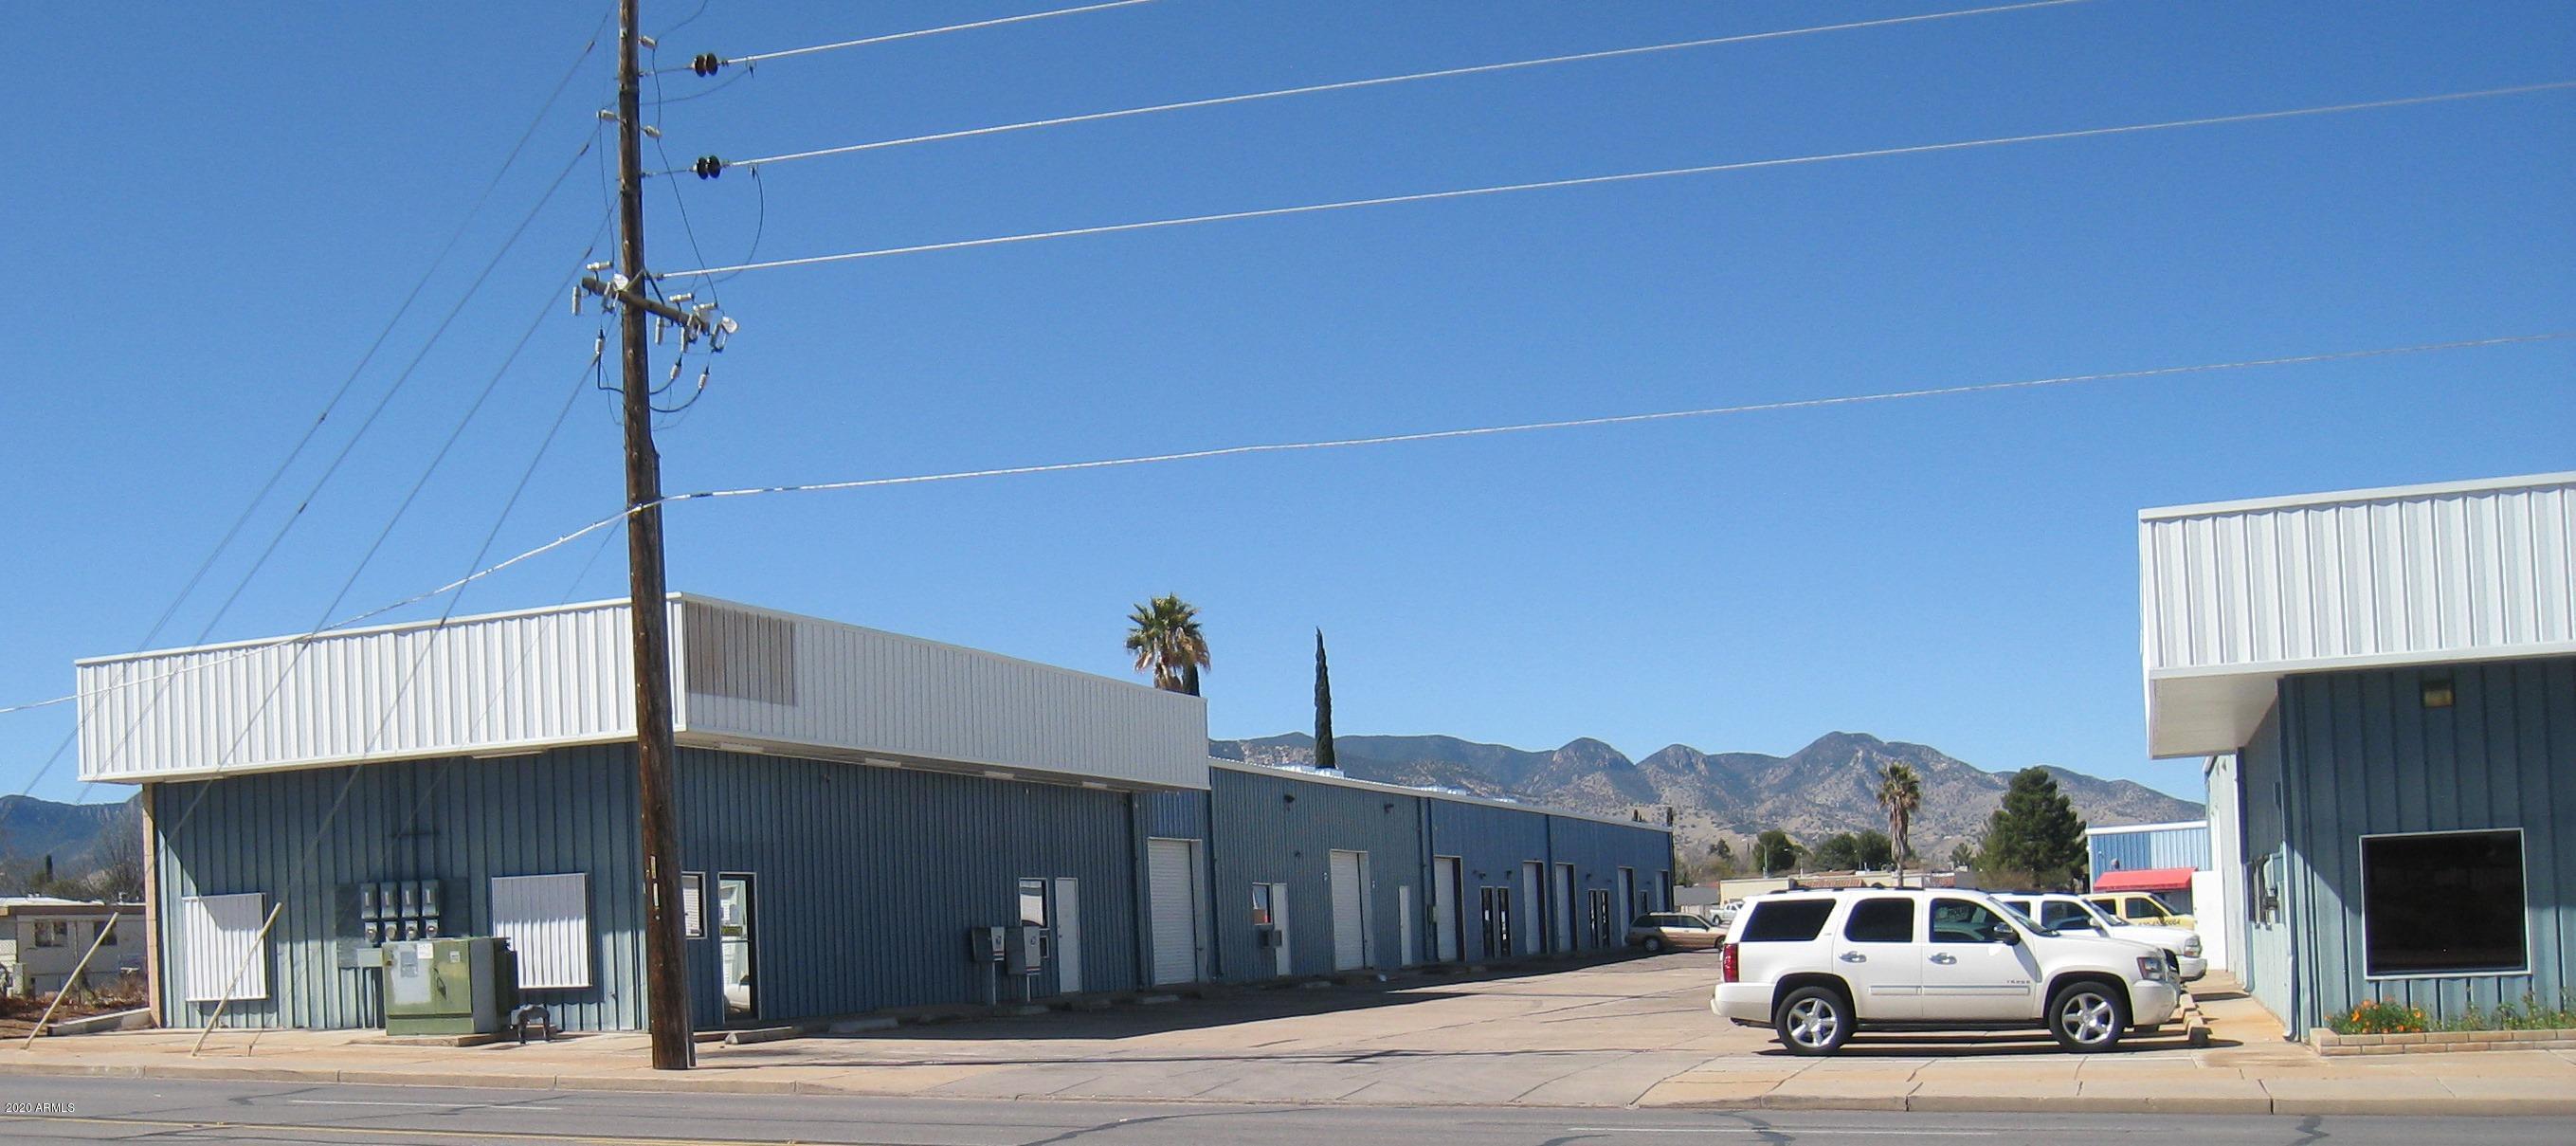 360 S 7TH ST Street, Sierra Vista, Arizona 85635, ,Commercial,For Sale,360 S 7TH ST Street,1,6045544